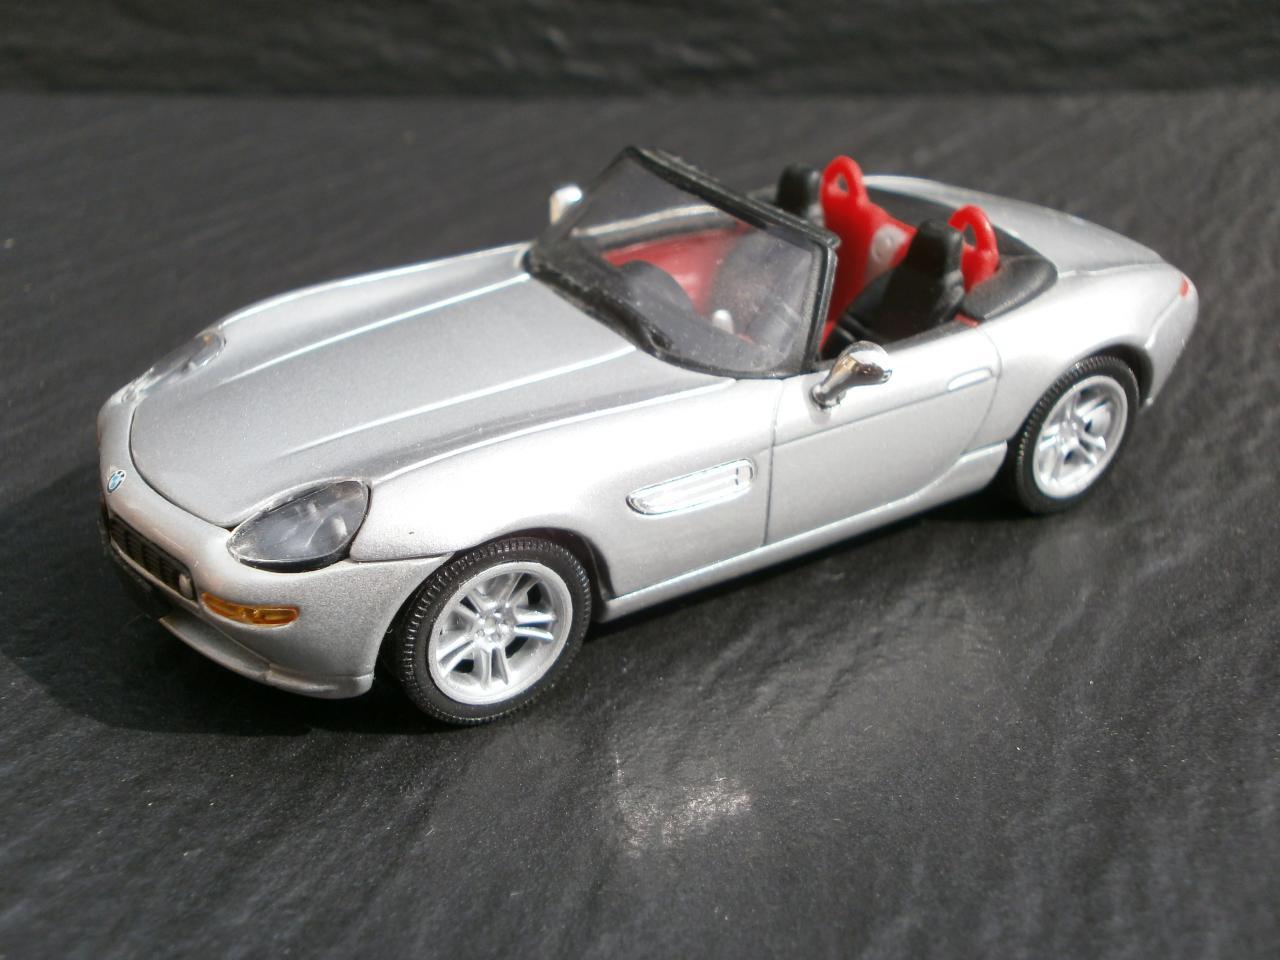 Bmw Z8 Model Cars Hobbydb